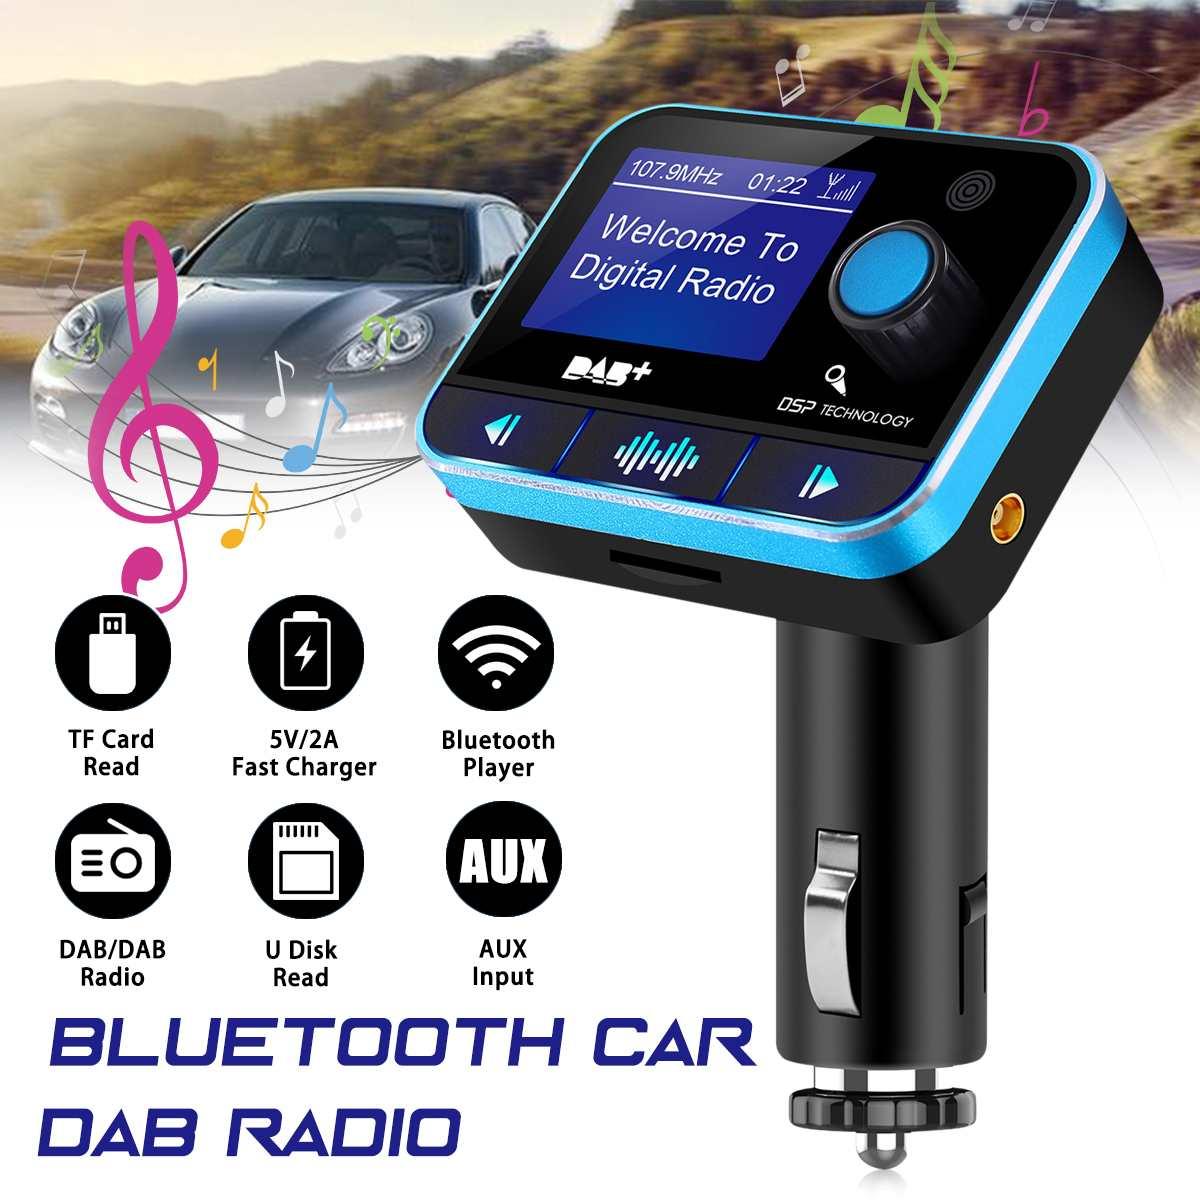 dab digital radio receiver fm tuner radio car bluetooth 4 2 transmitter adapter fm dav dab tuner. Black Bedroom Furniture Sets. Home Design Ideas